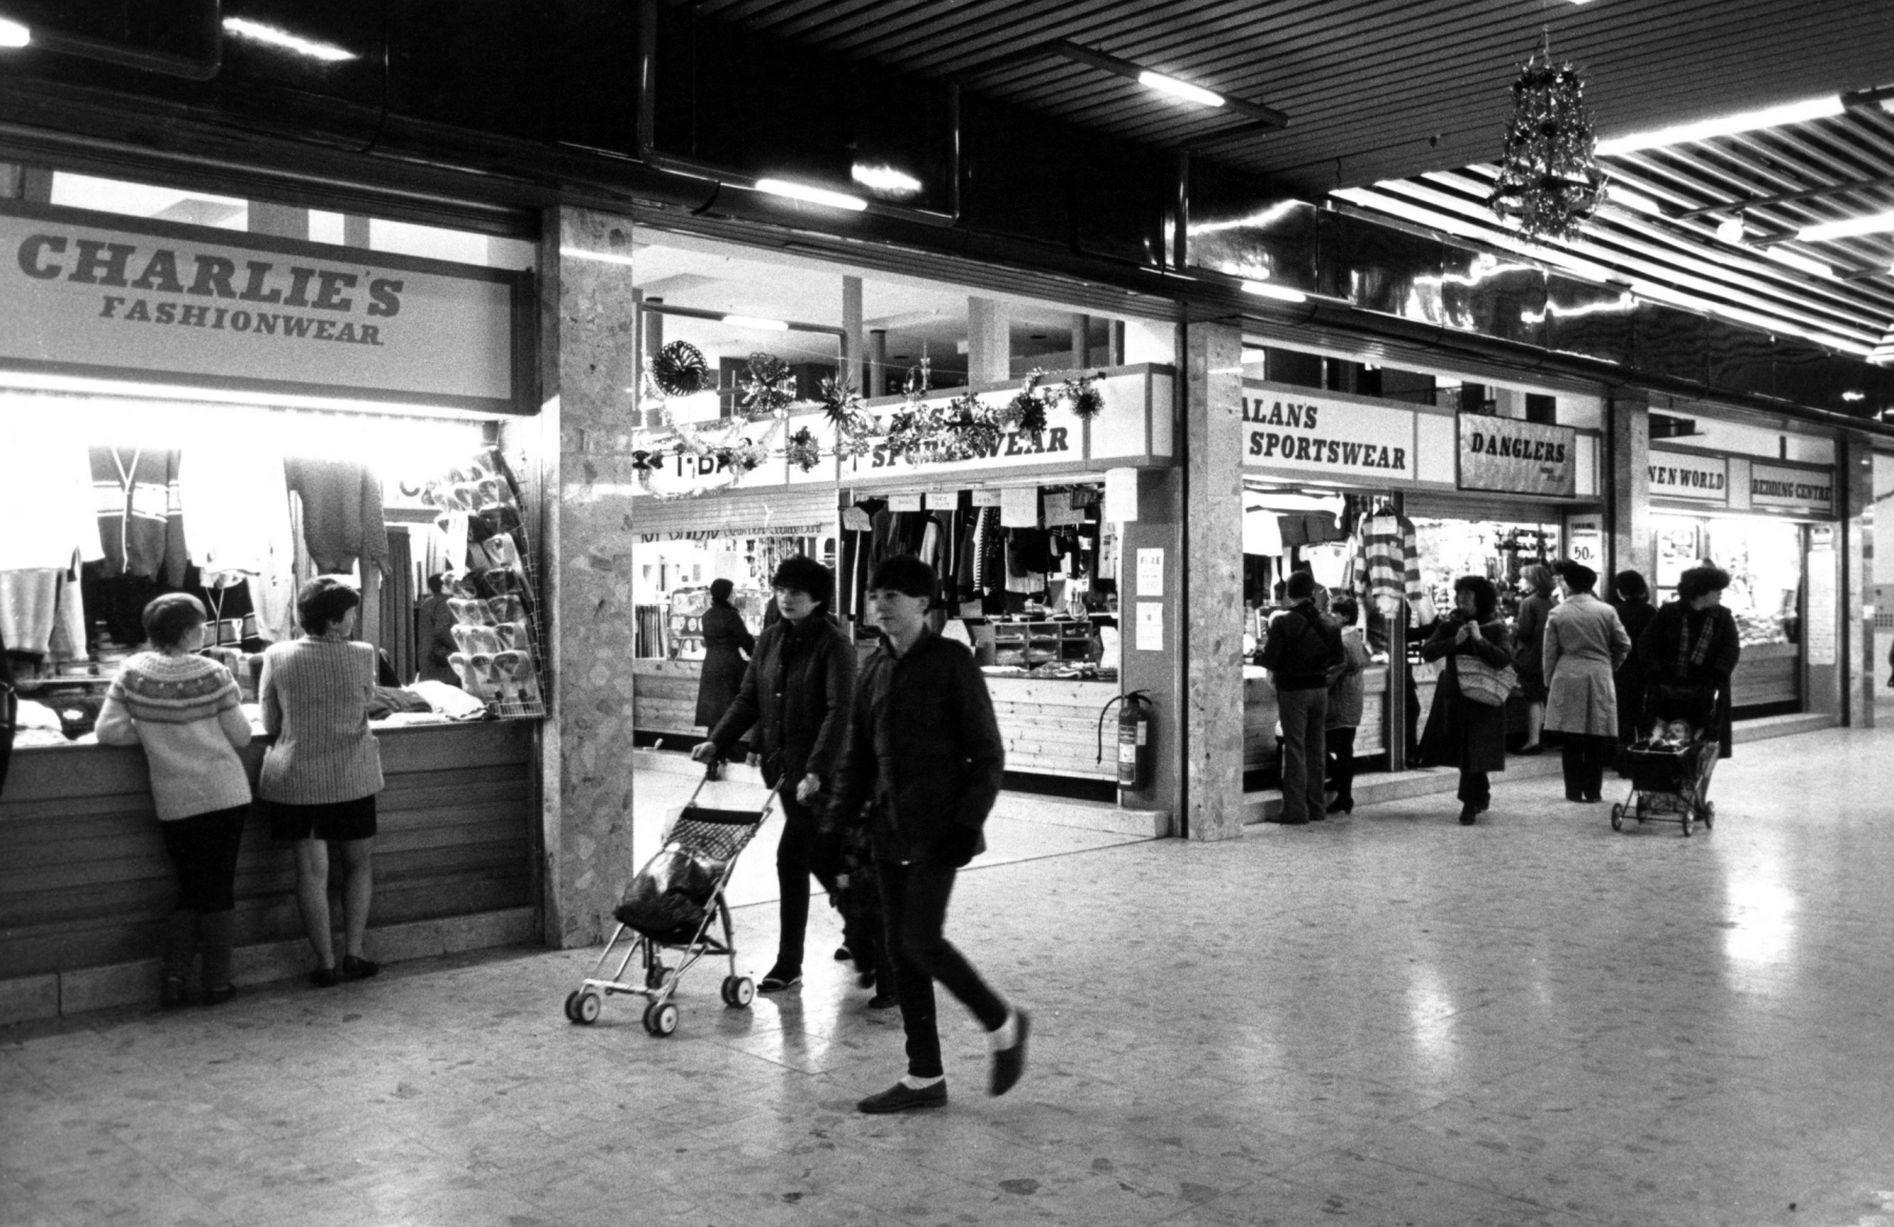 aace369a276 Shops of the 80s and 90s you may (or may not) have forgotten   Home ...